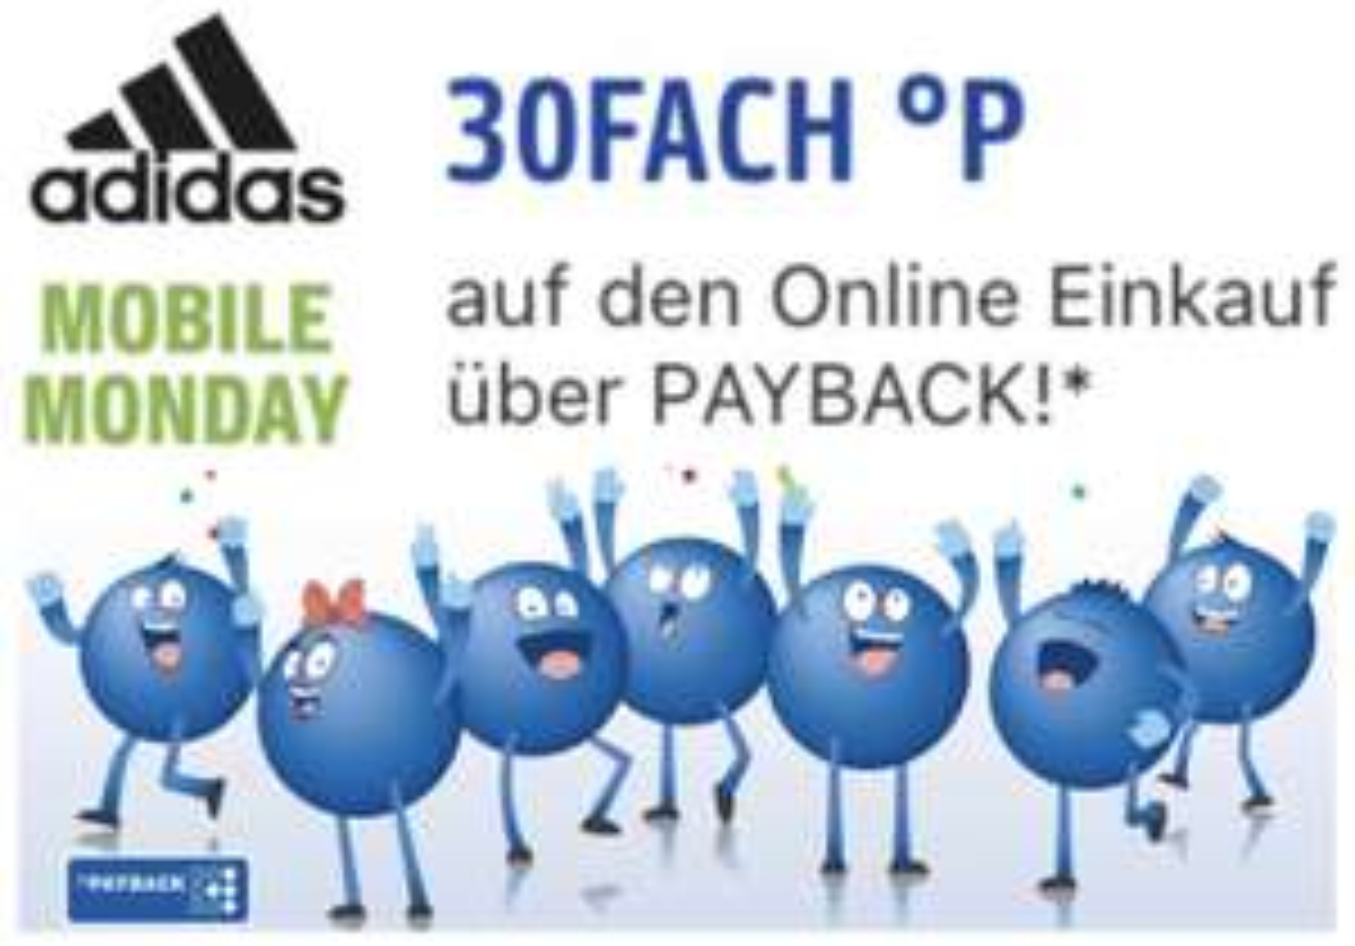 Mobile Monday: 30-fache Payback Punkte bei Adidas - entspricht rd. 15% Cashback!